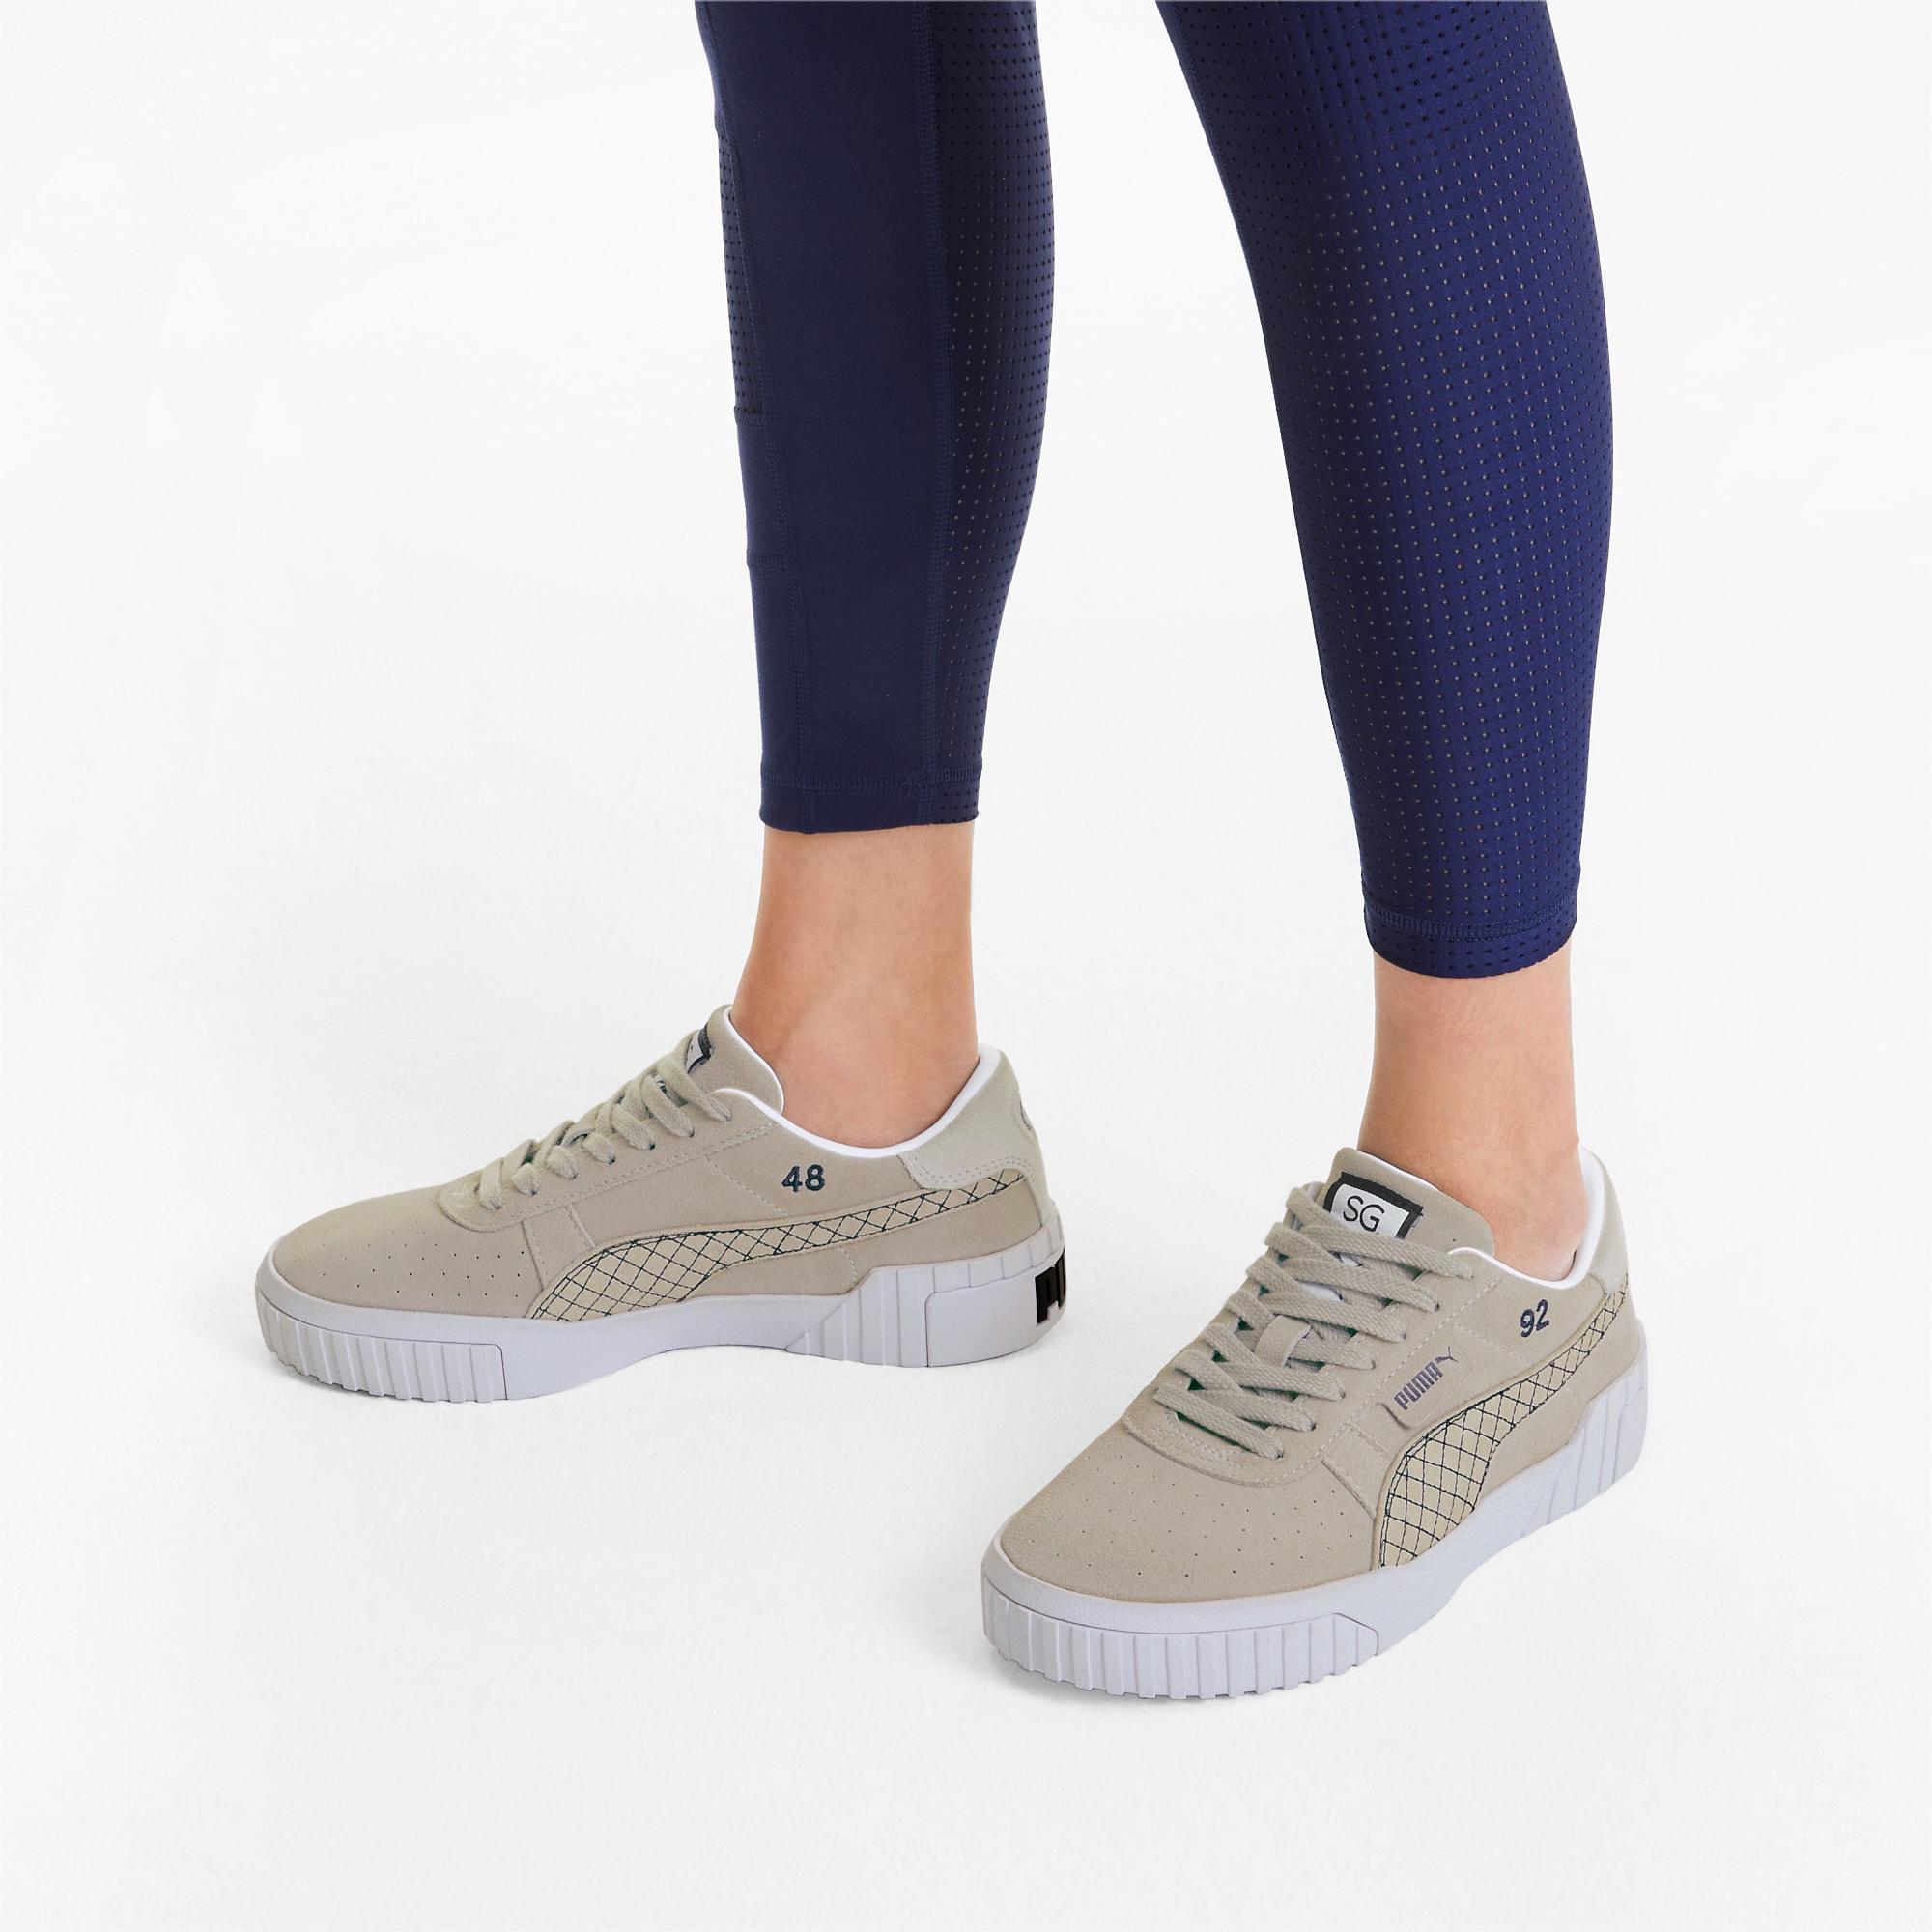 SG x PUMA Cali Suede Women's Sneakers